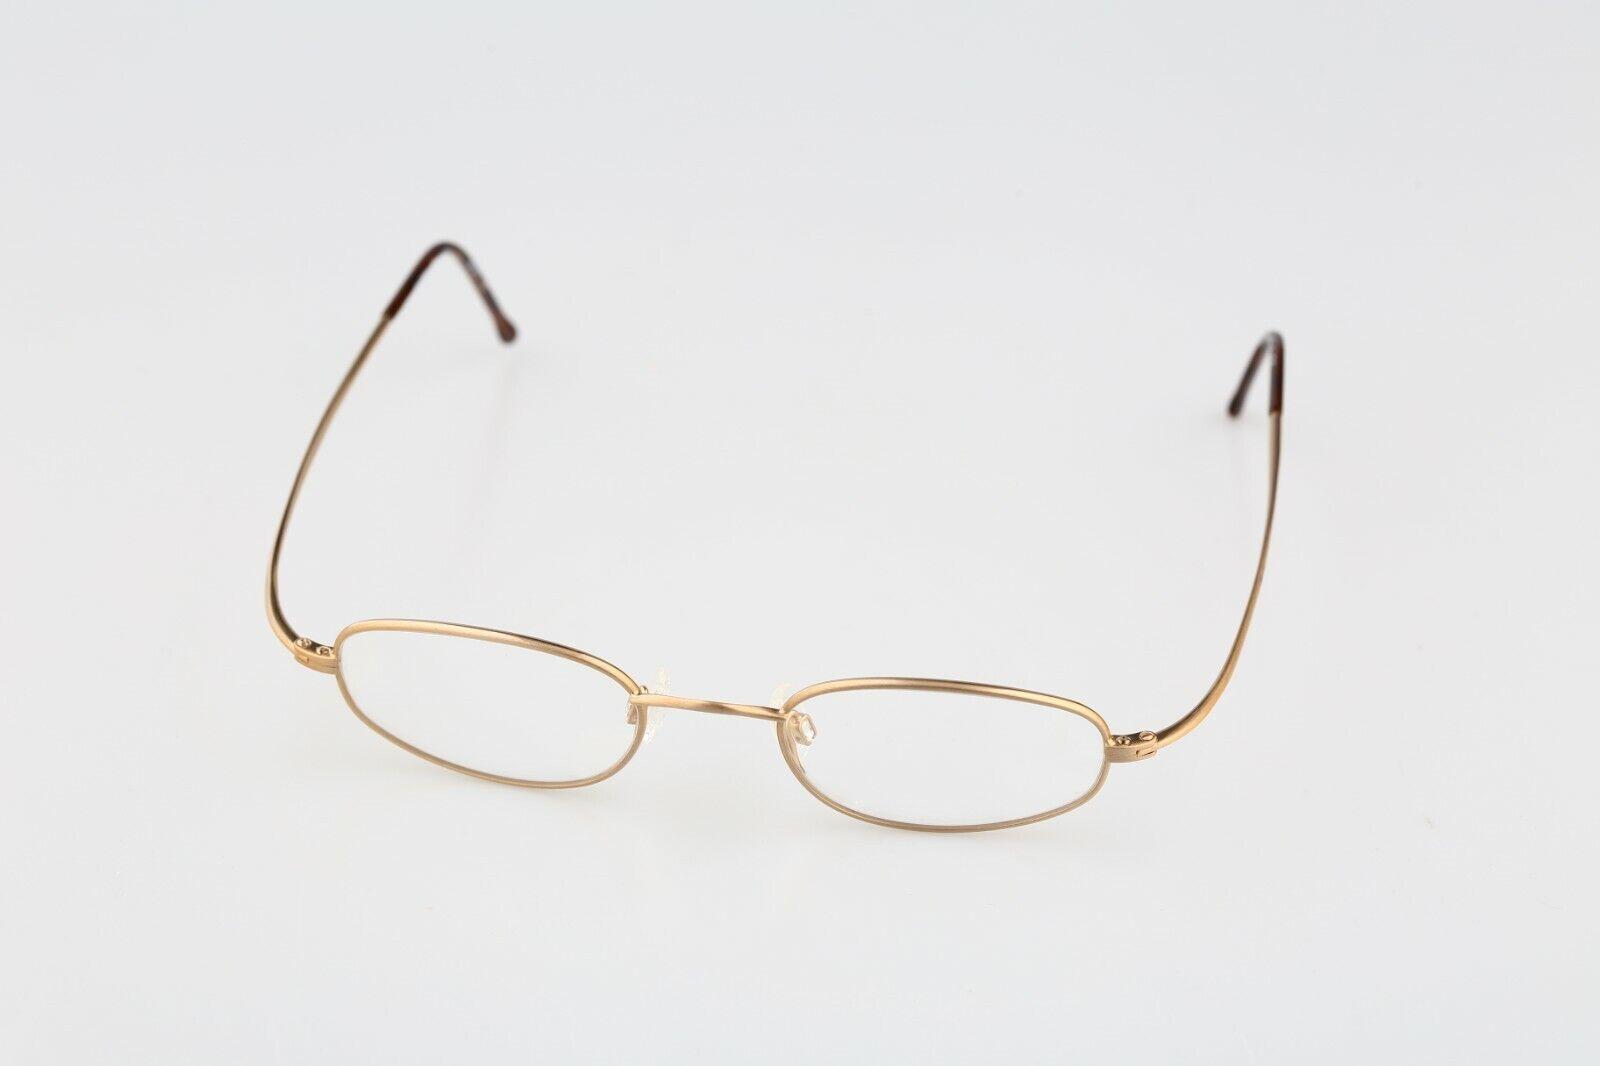 Silhouette M 7306 30 V 6051, Vintage 90s gold small rectangle glasses frames